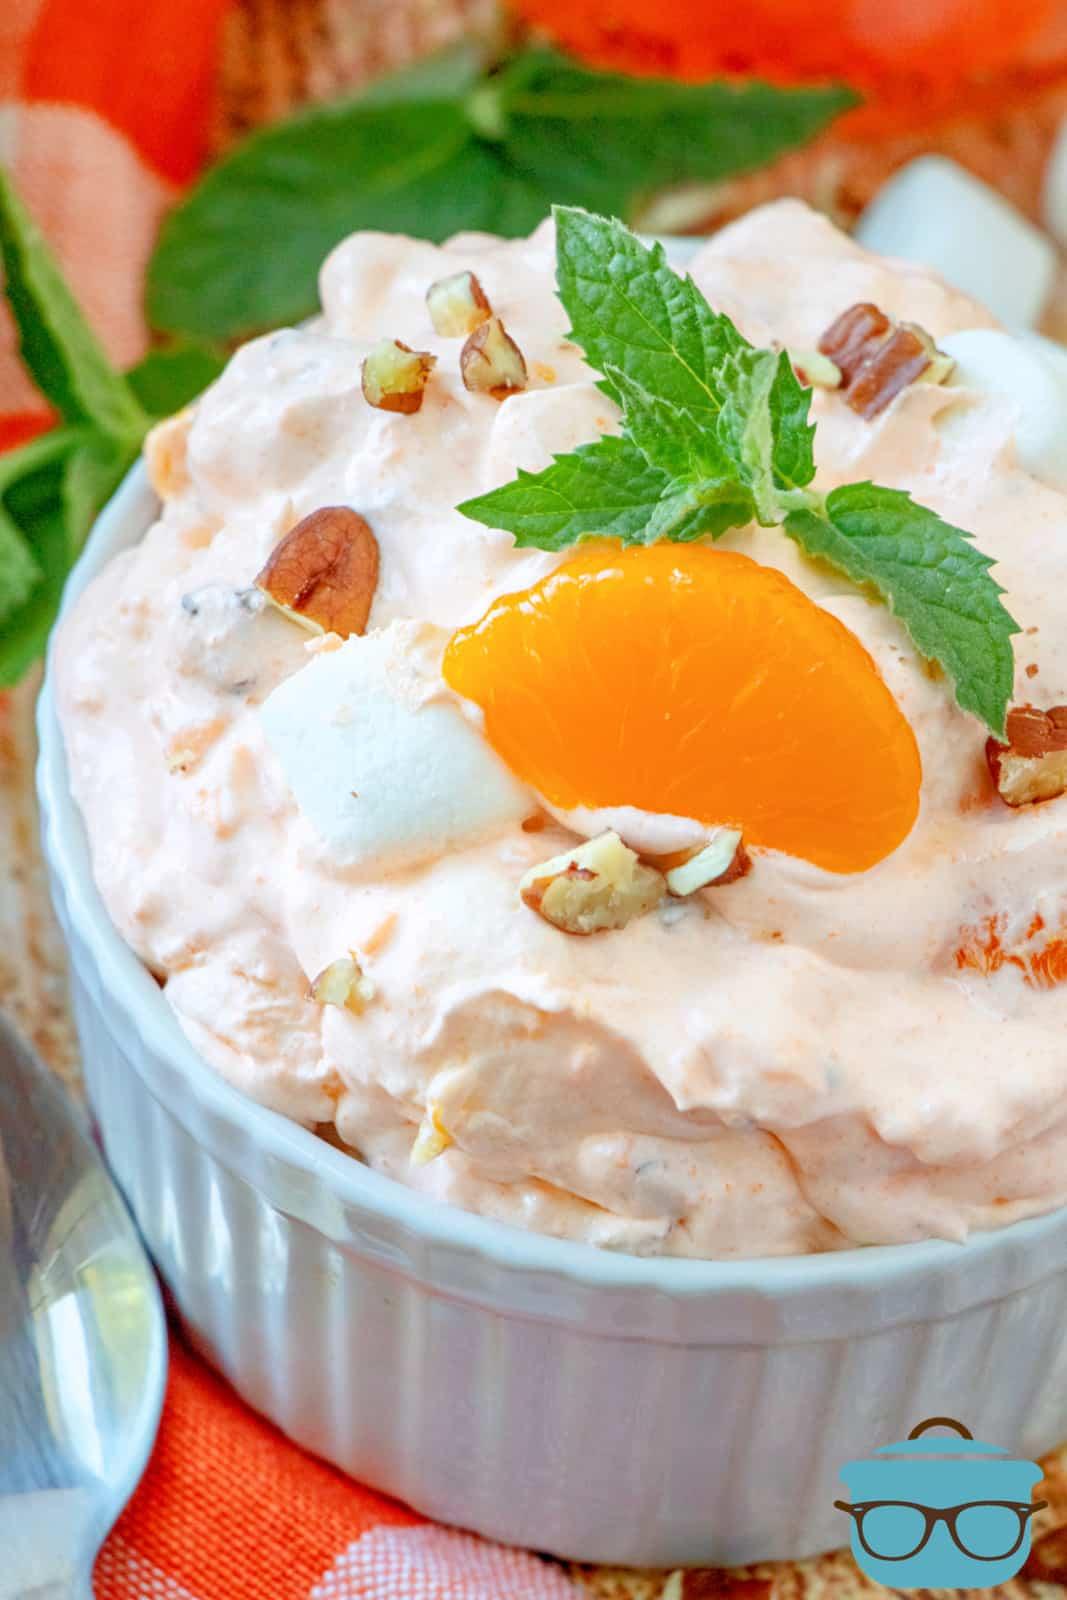 closeup photo of orange fluff dessert in white ramekin, topped with a mandarin orange slice and a sprig of mint.